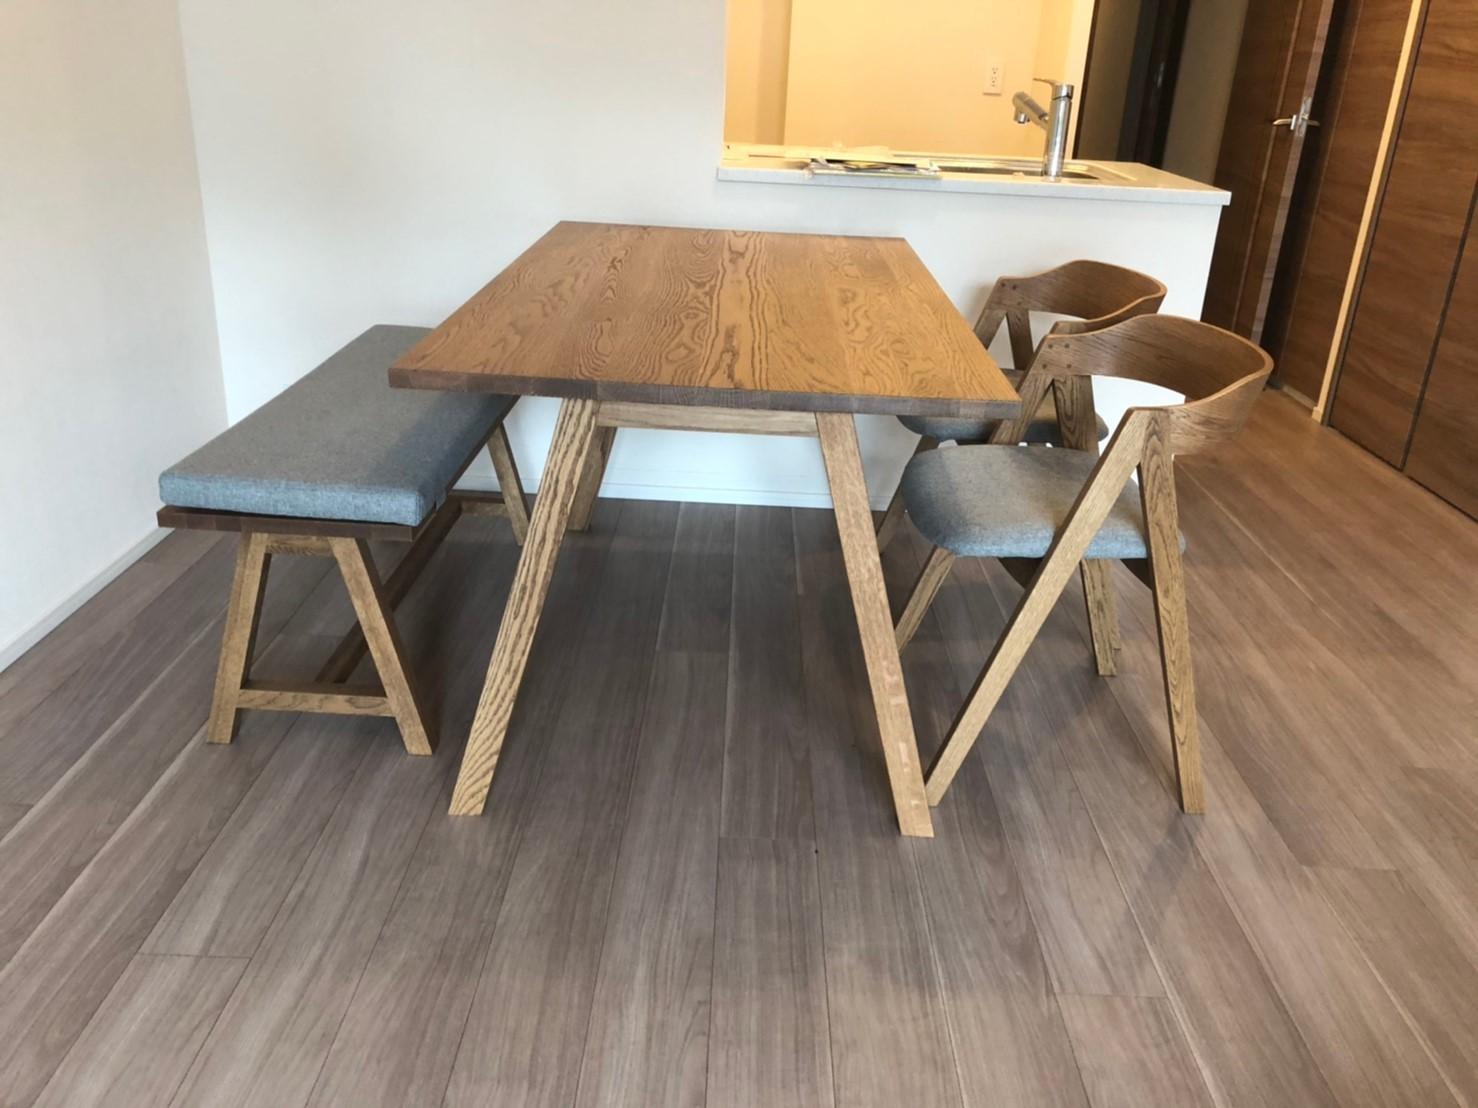 unicoのソファーとテーブル_e0415520_10184541.jpg